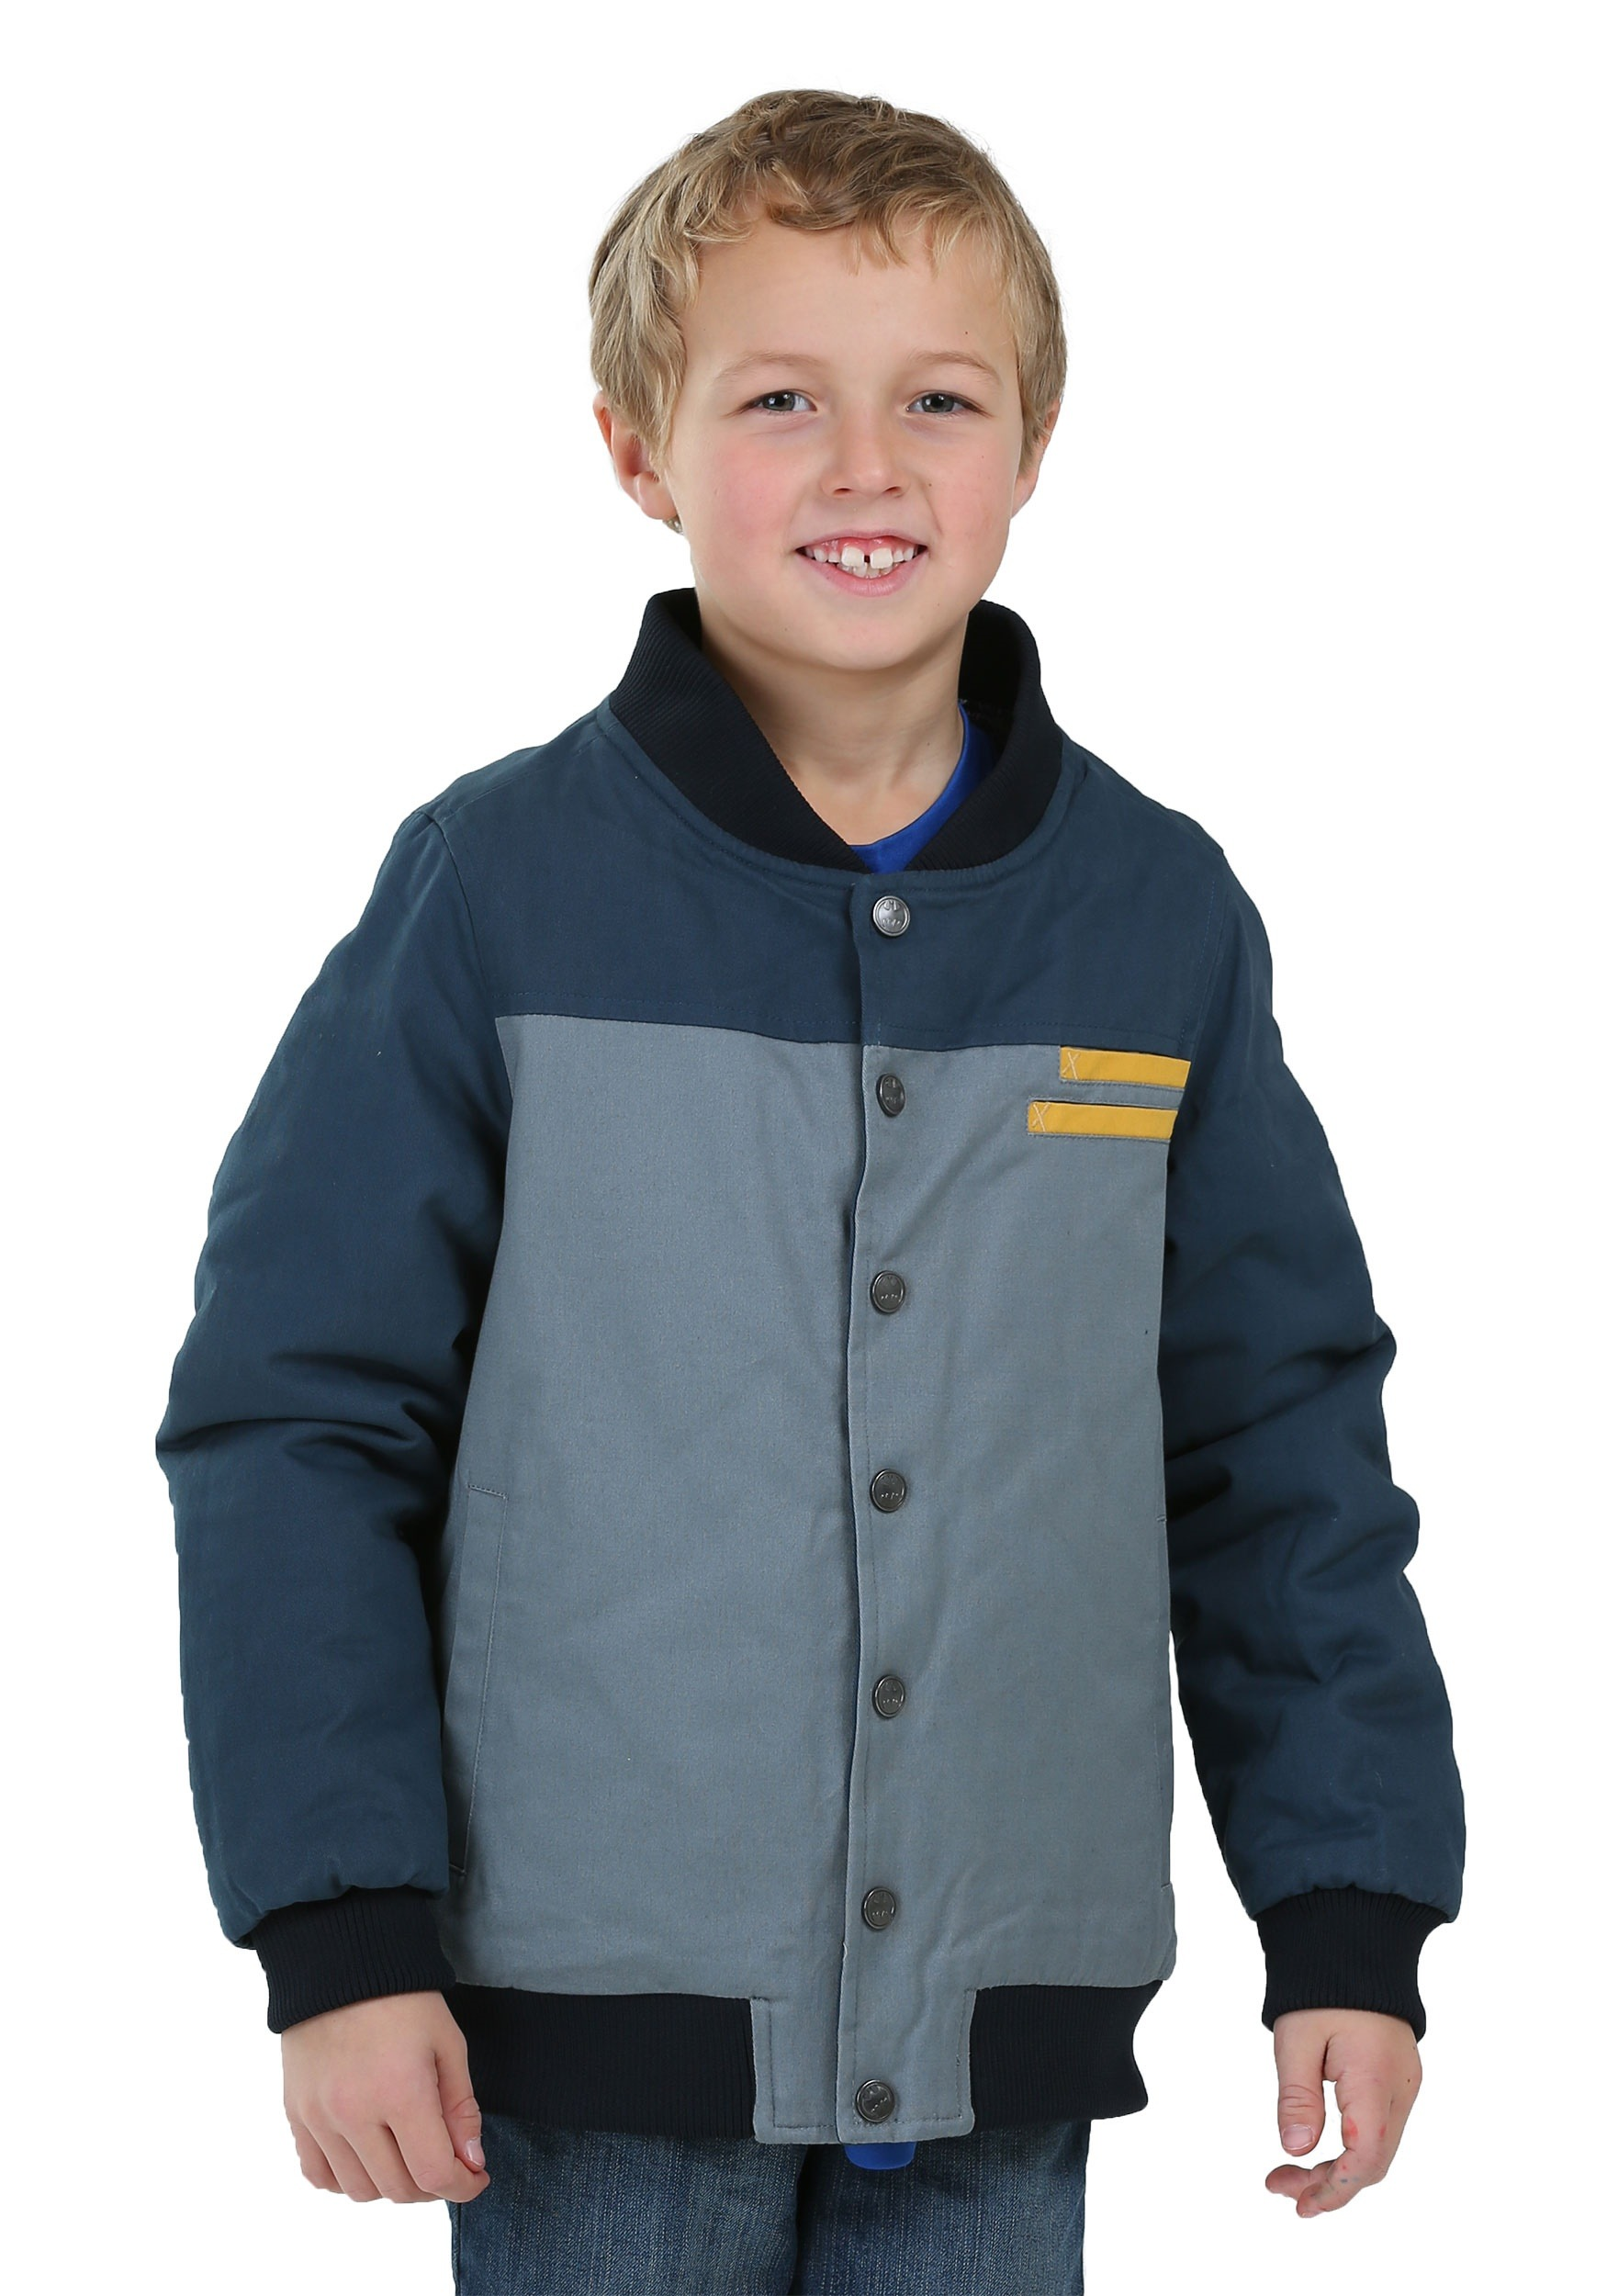 Kids Batman Casual Super Hero Jacket (Secret Identity) FUN9033CH